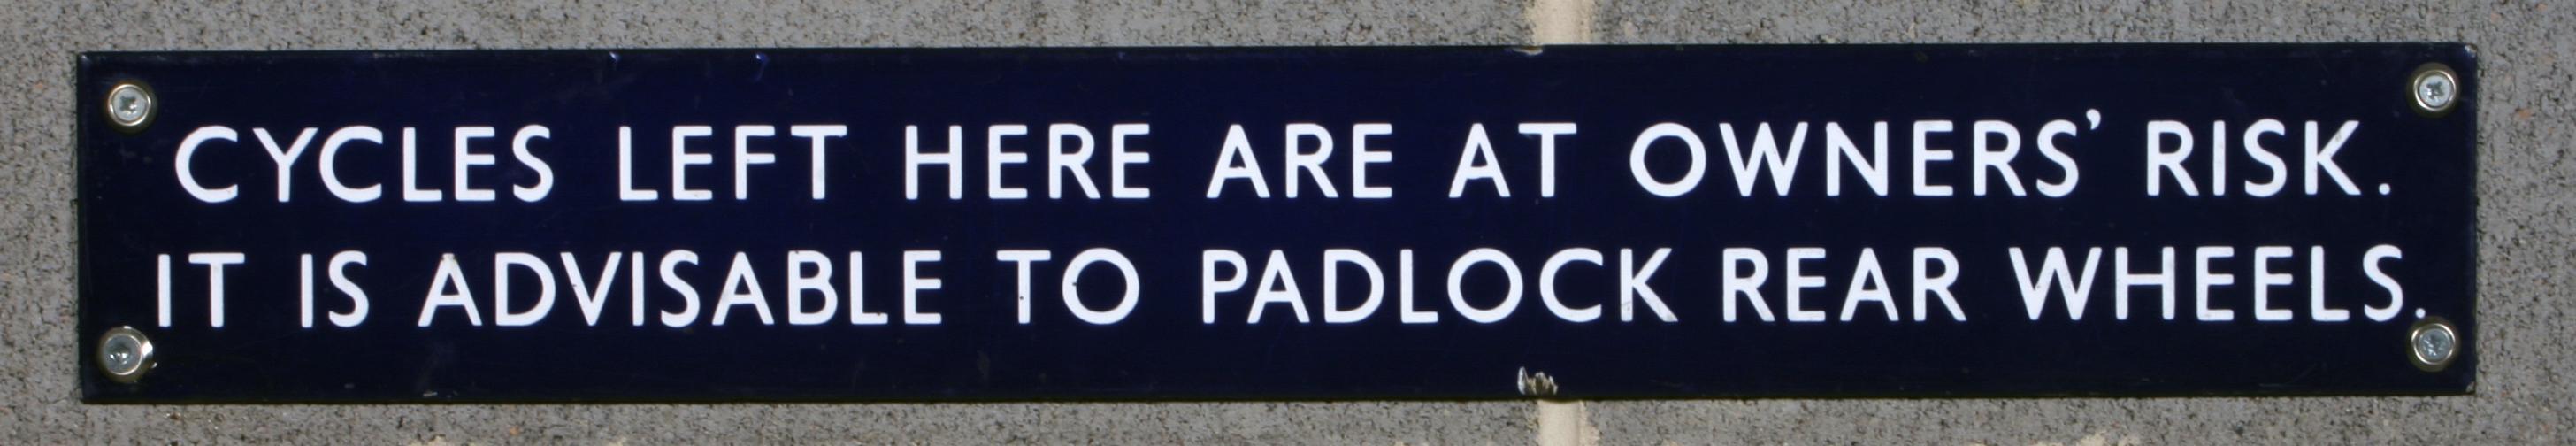 British Rail (Eastern Region) notice - 2007.